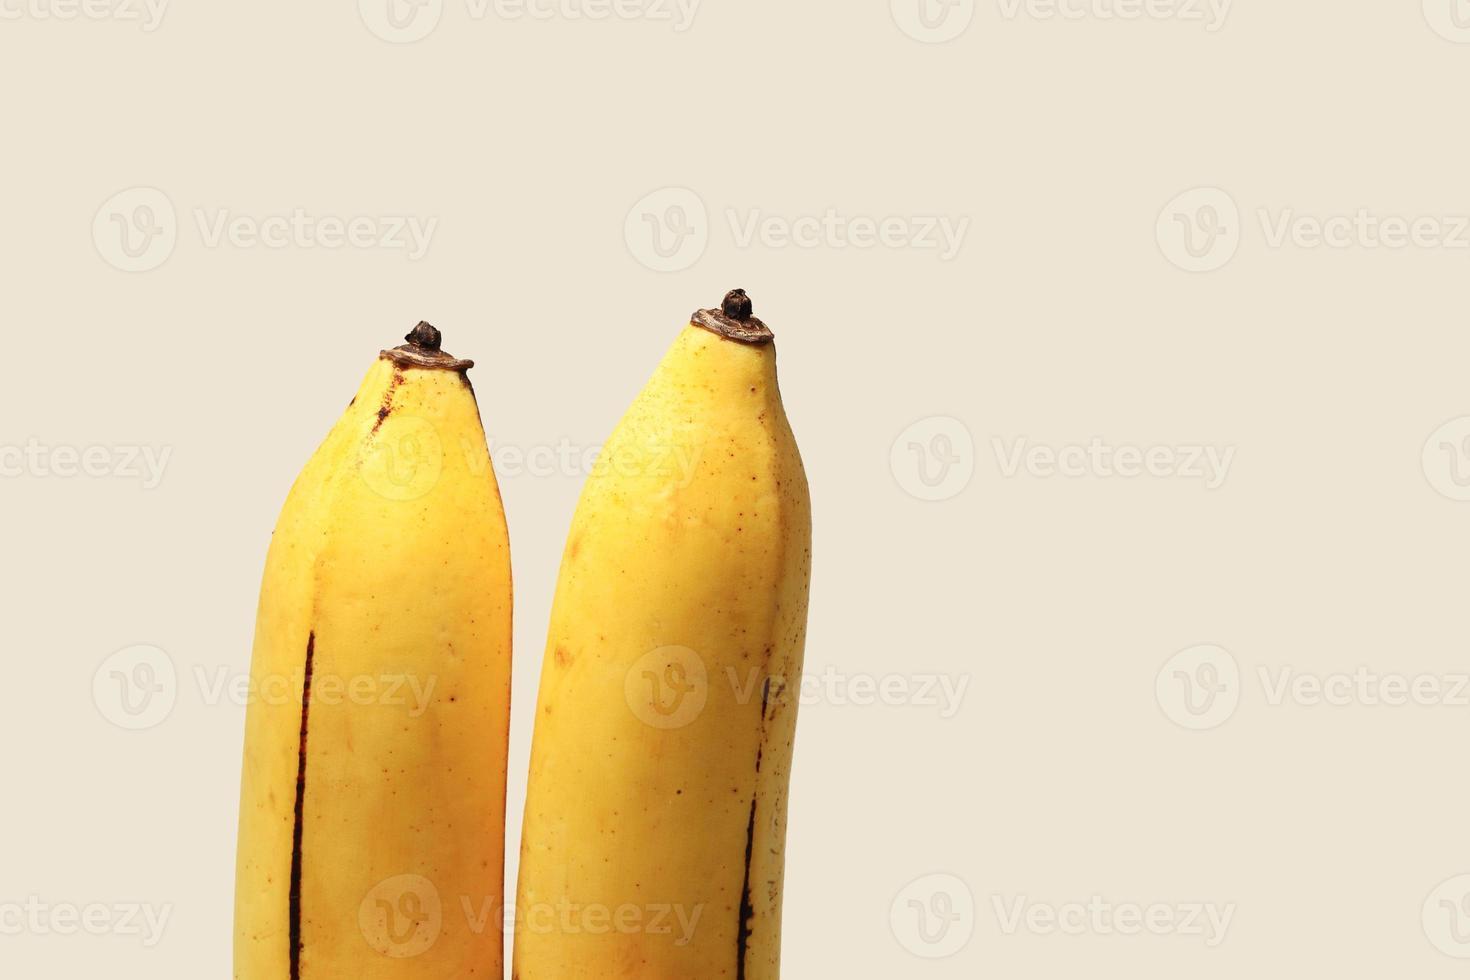 due banane isolate su sfondo color crema foto